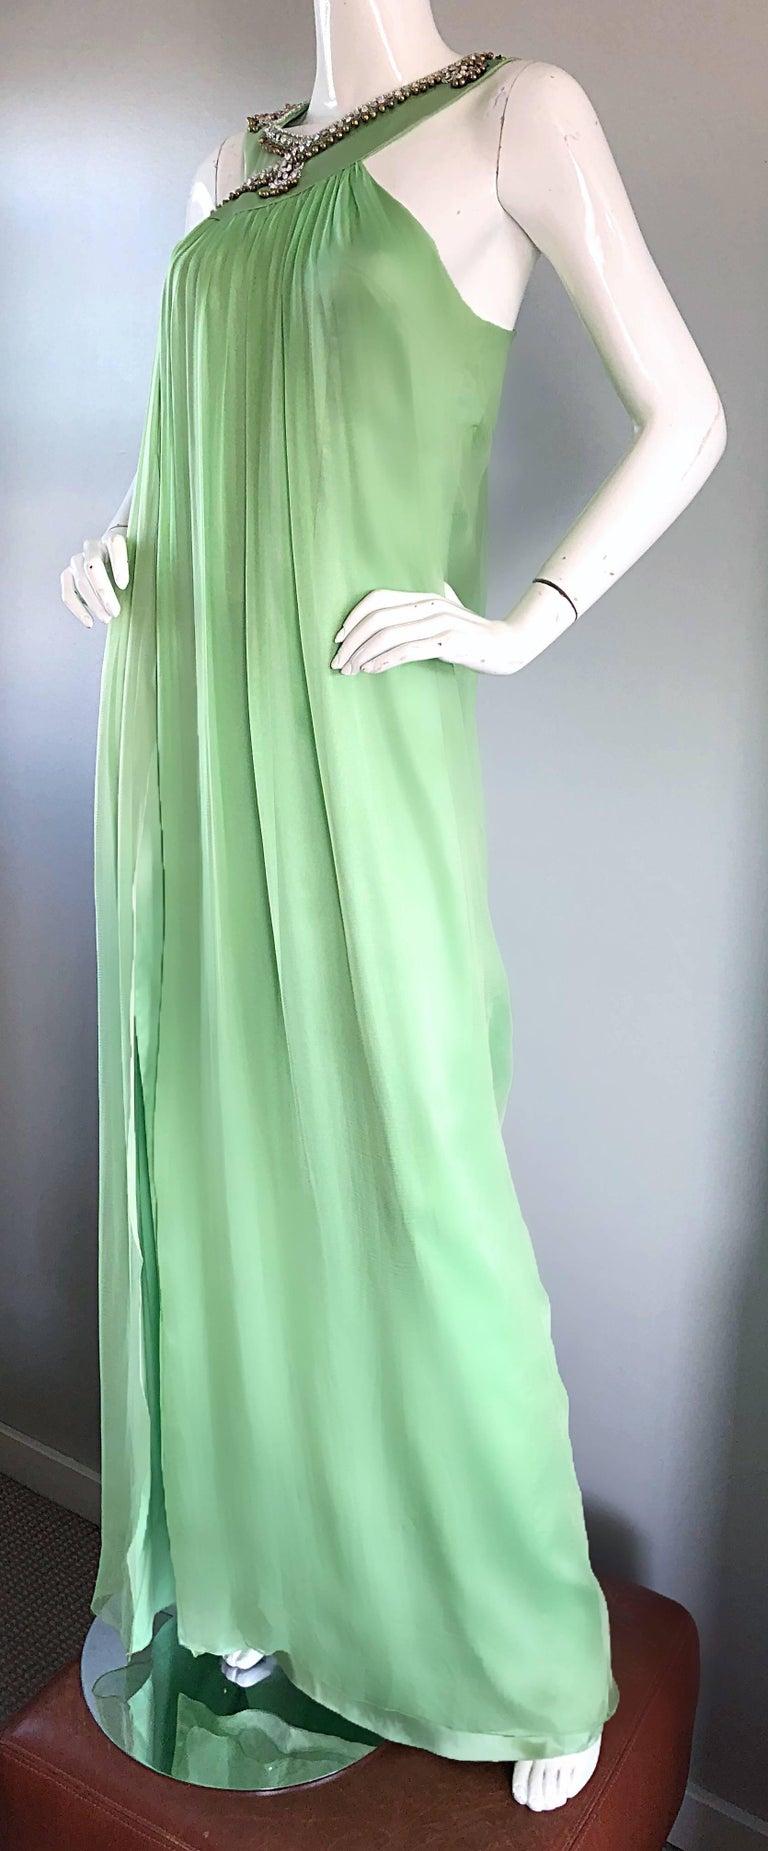 New Christian Dior John Galliano Light Green Silk Chiffon Grecian Gown, Sz 10   For Sale 1